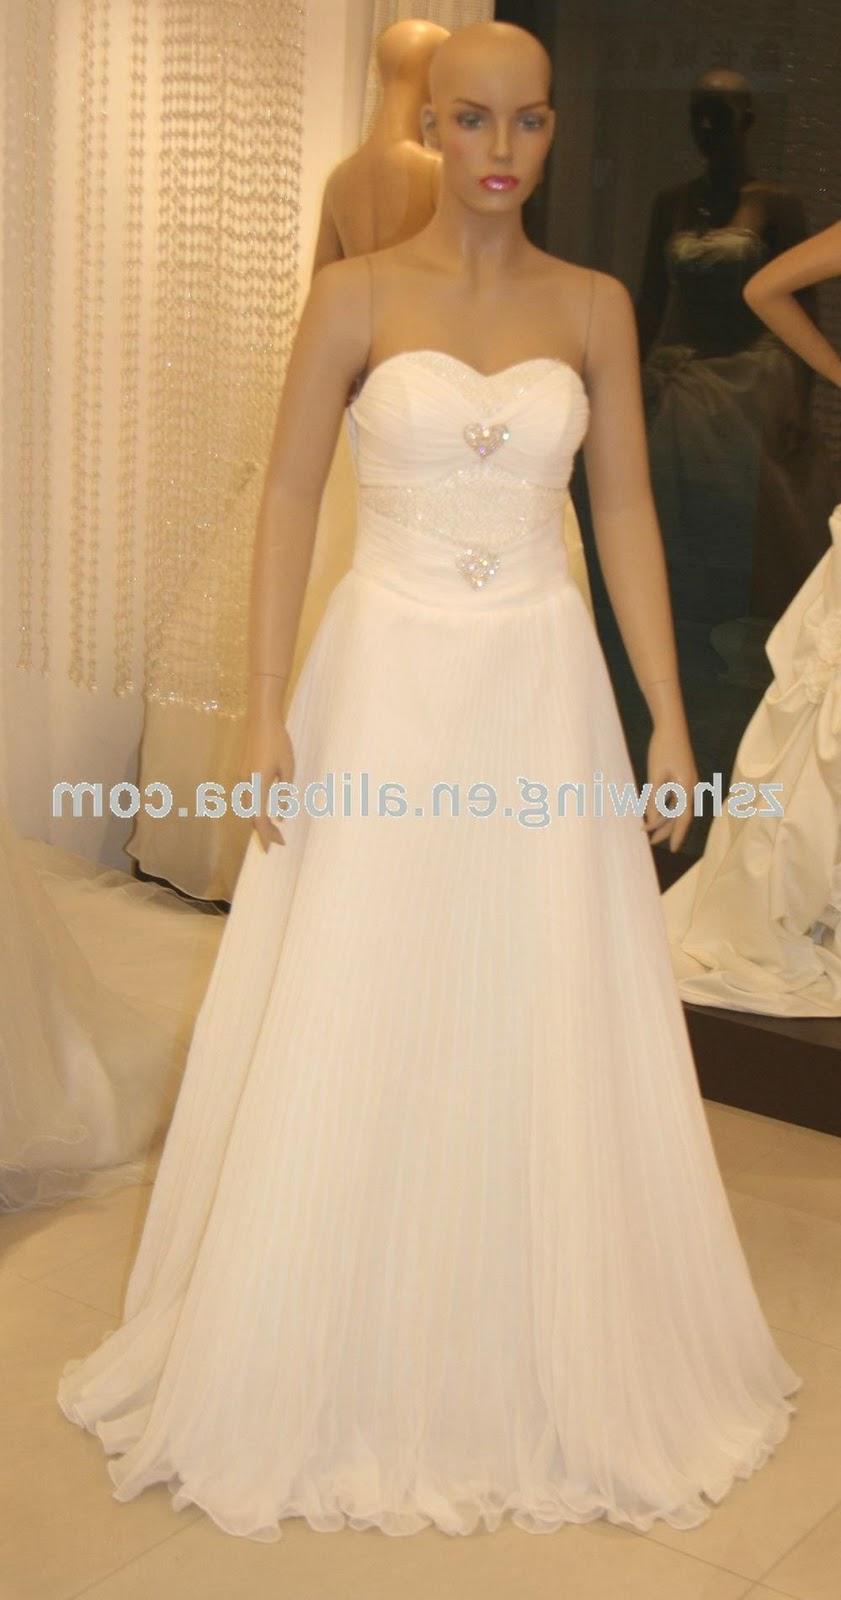 SSW036 lime green wedding dresses